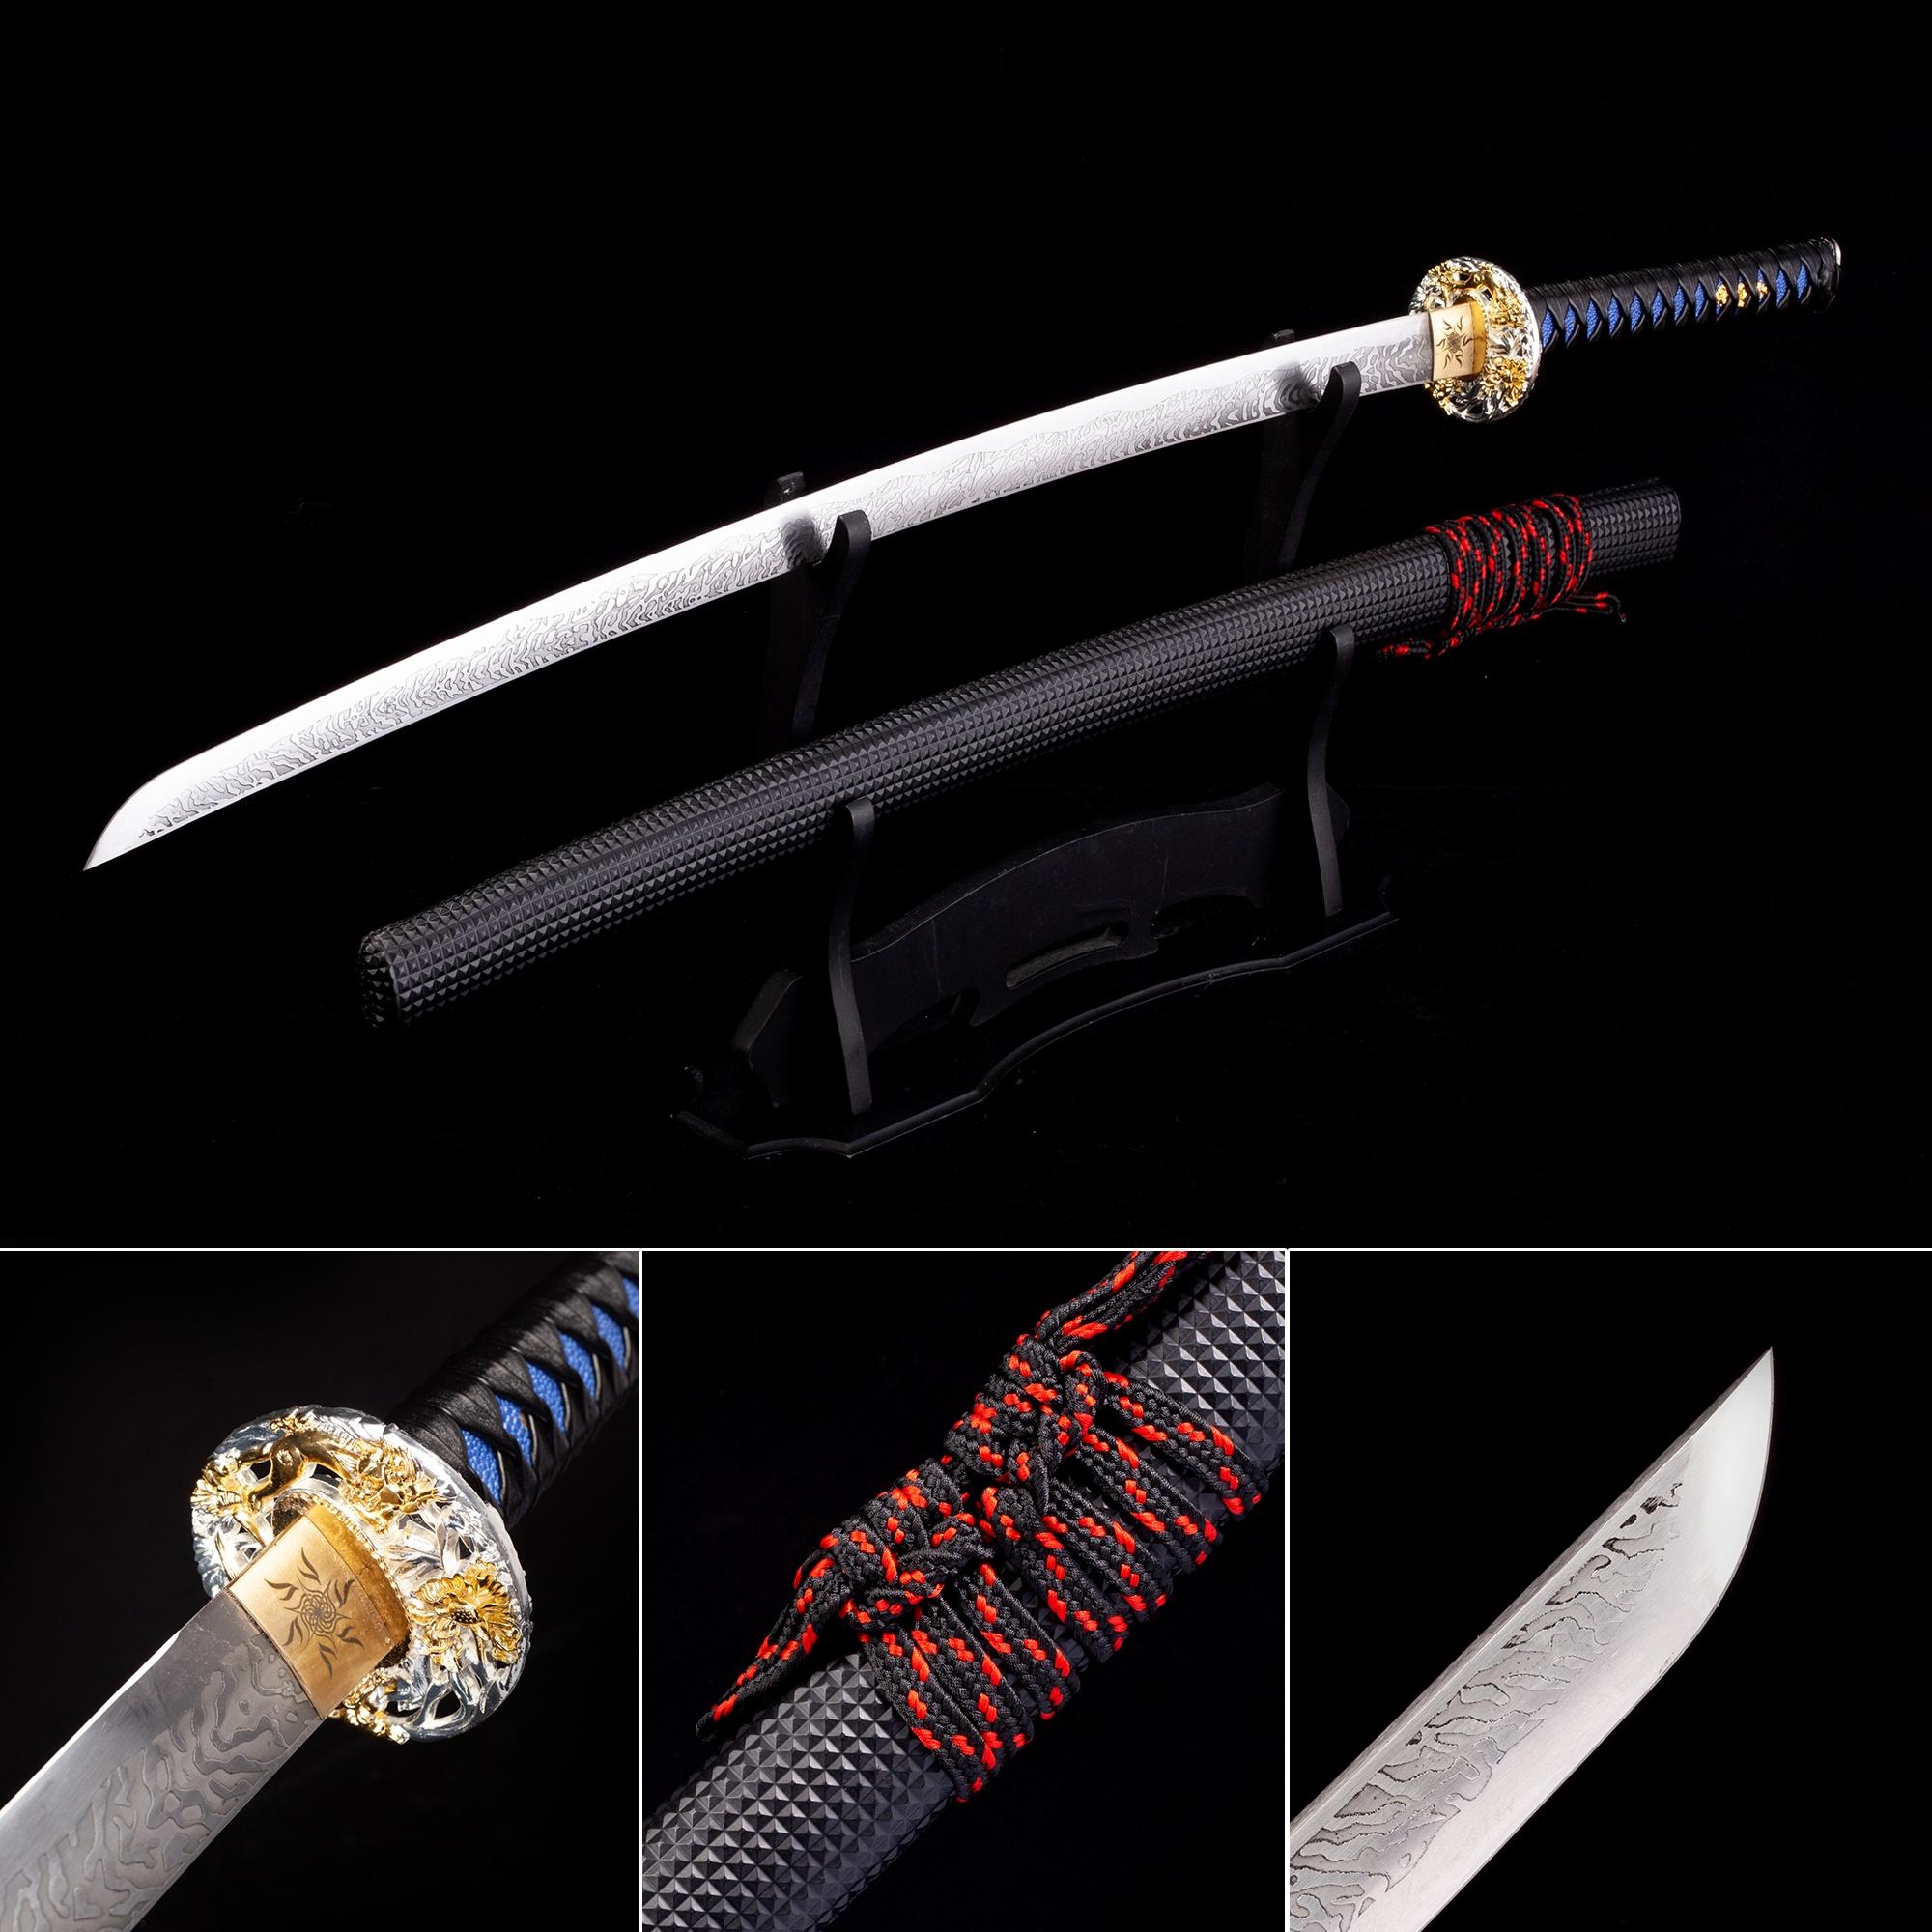 Handmade High Manganese Steel Real Japanese Katana Samurai Swords With Black Leather Scabbard